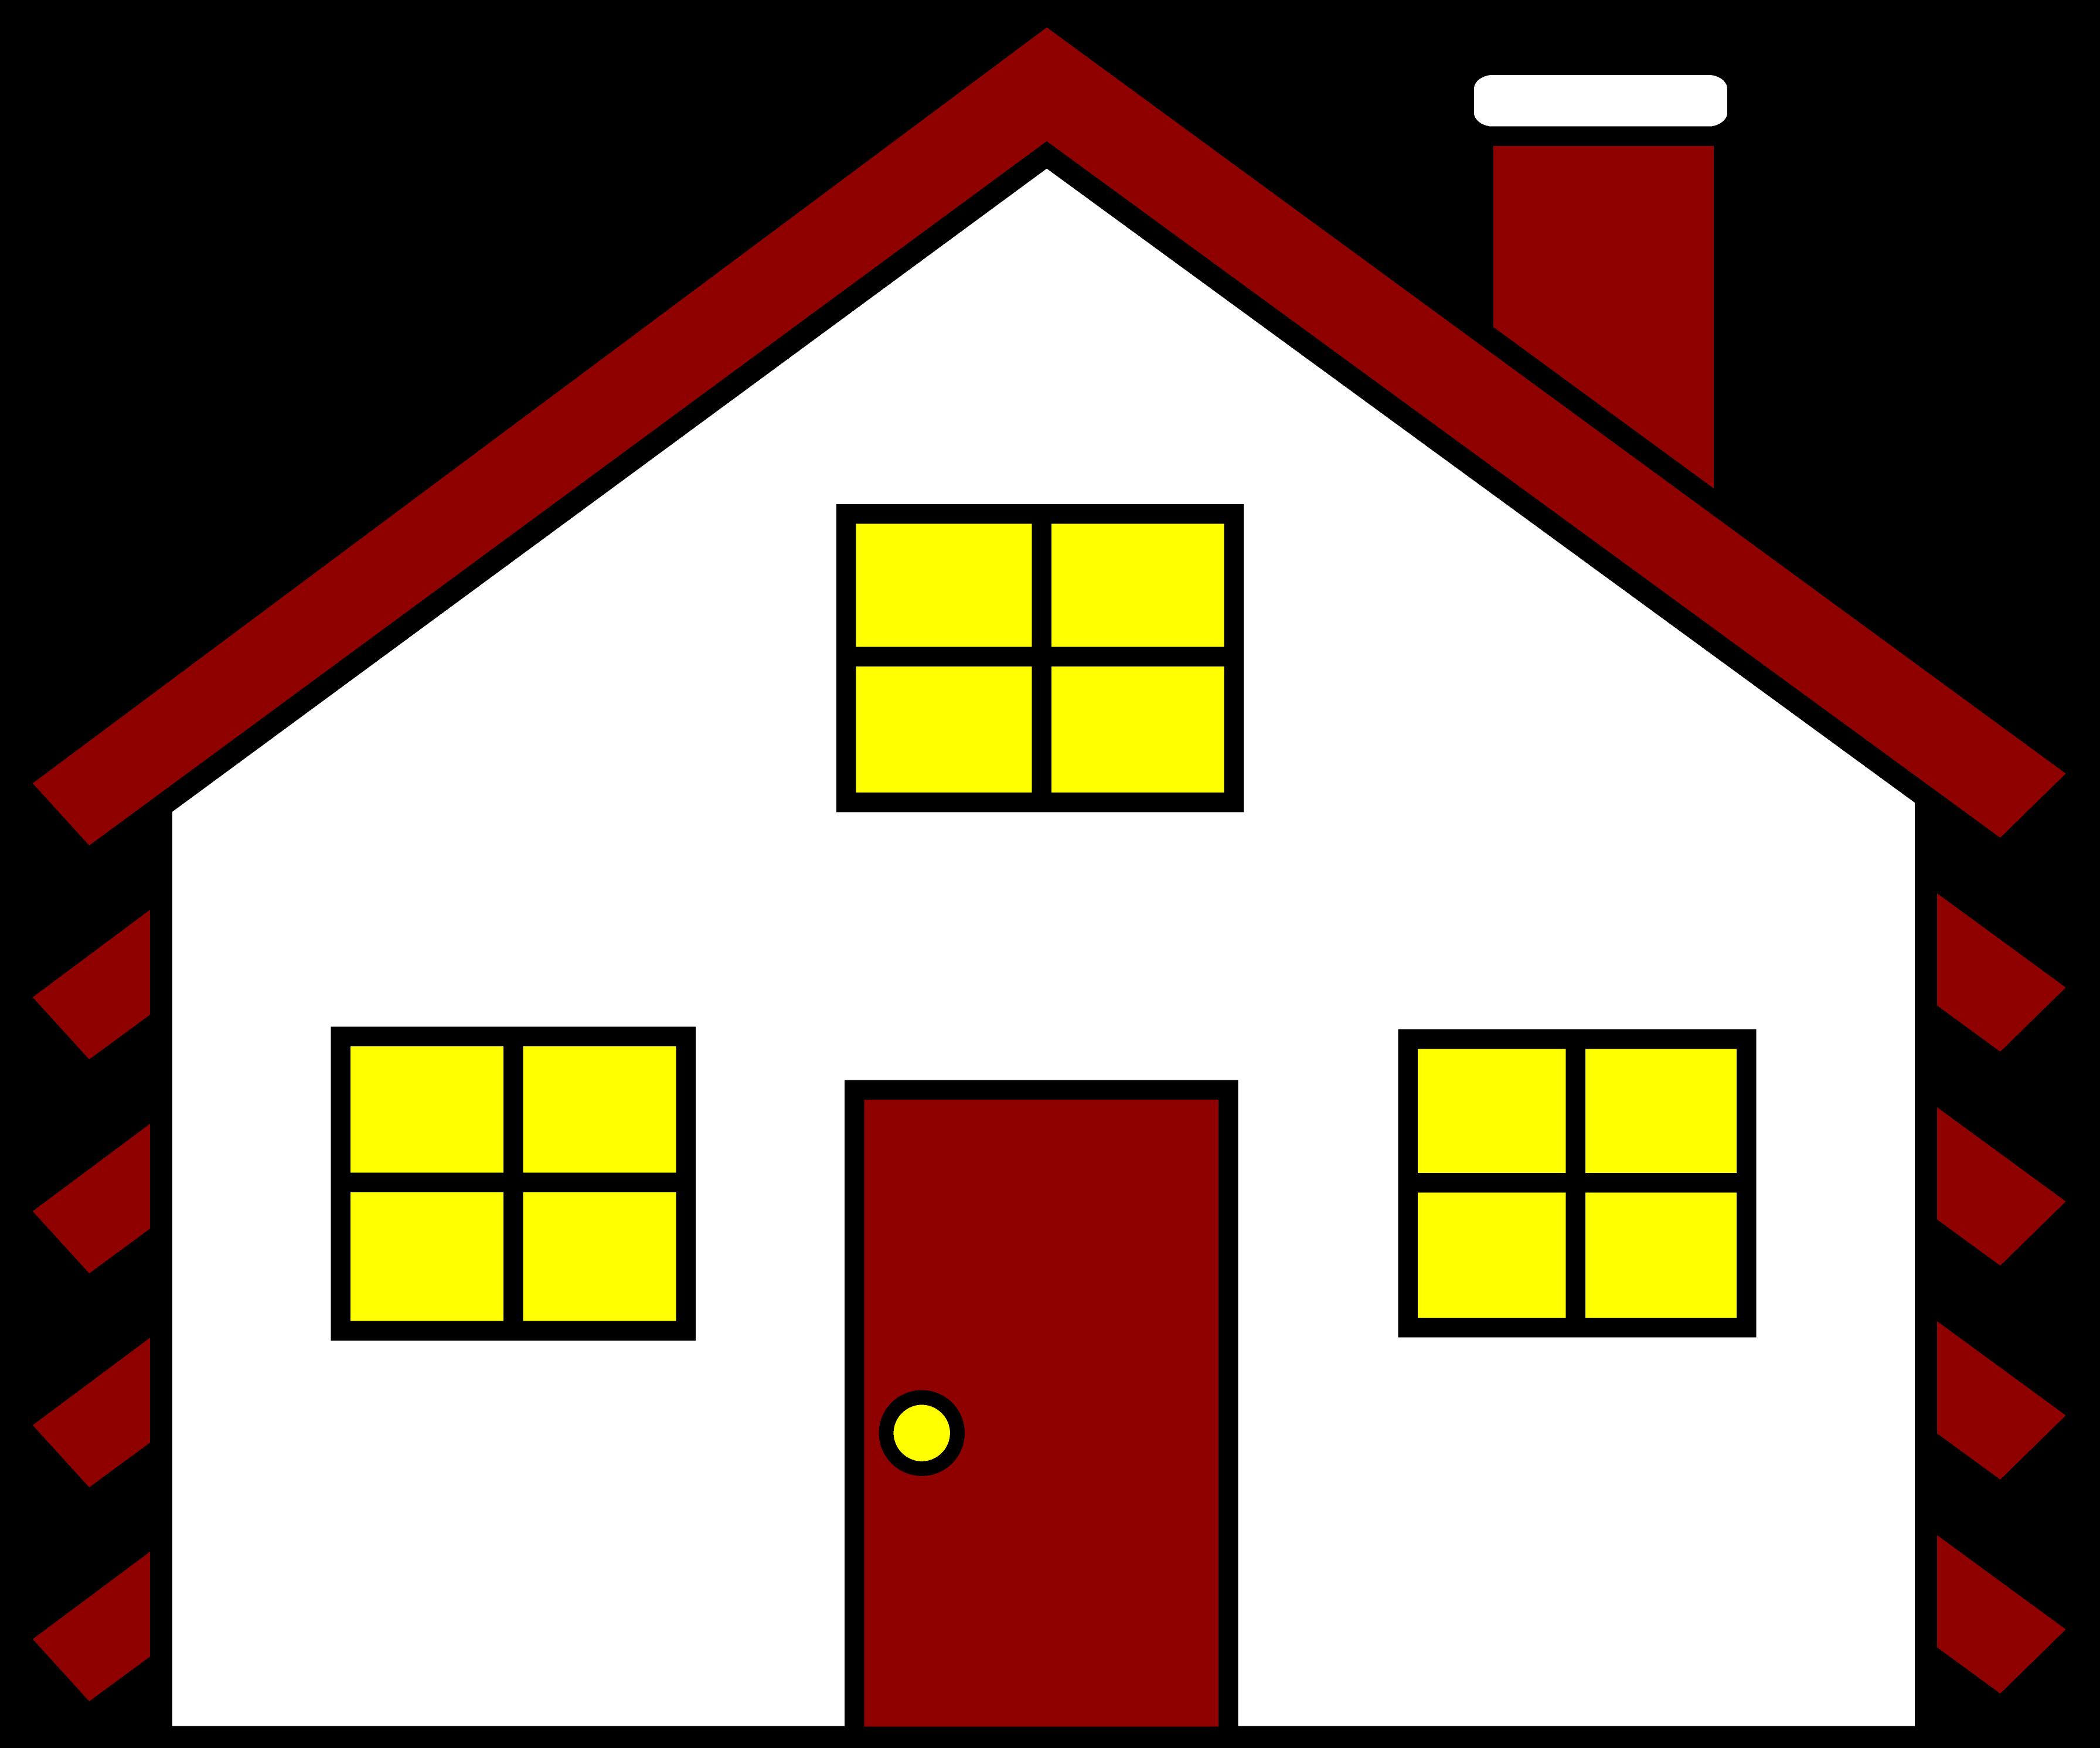 A House Clipart | Houses | Home Image Area